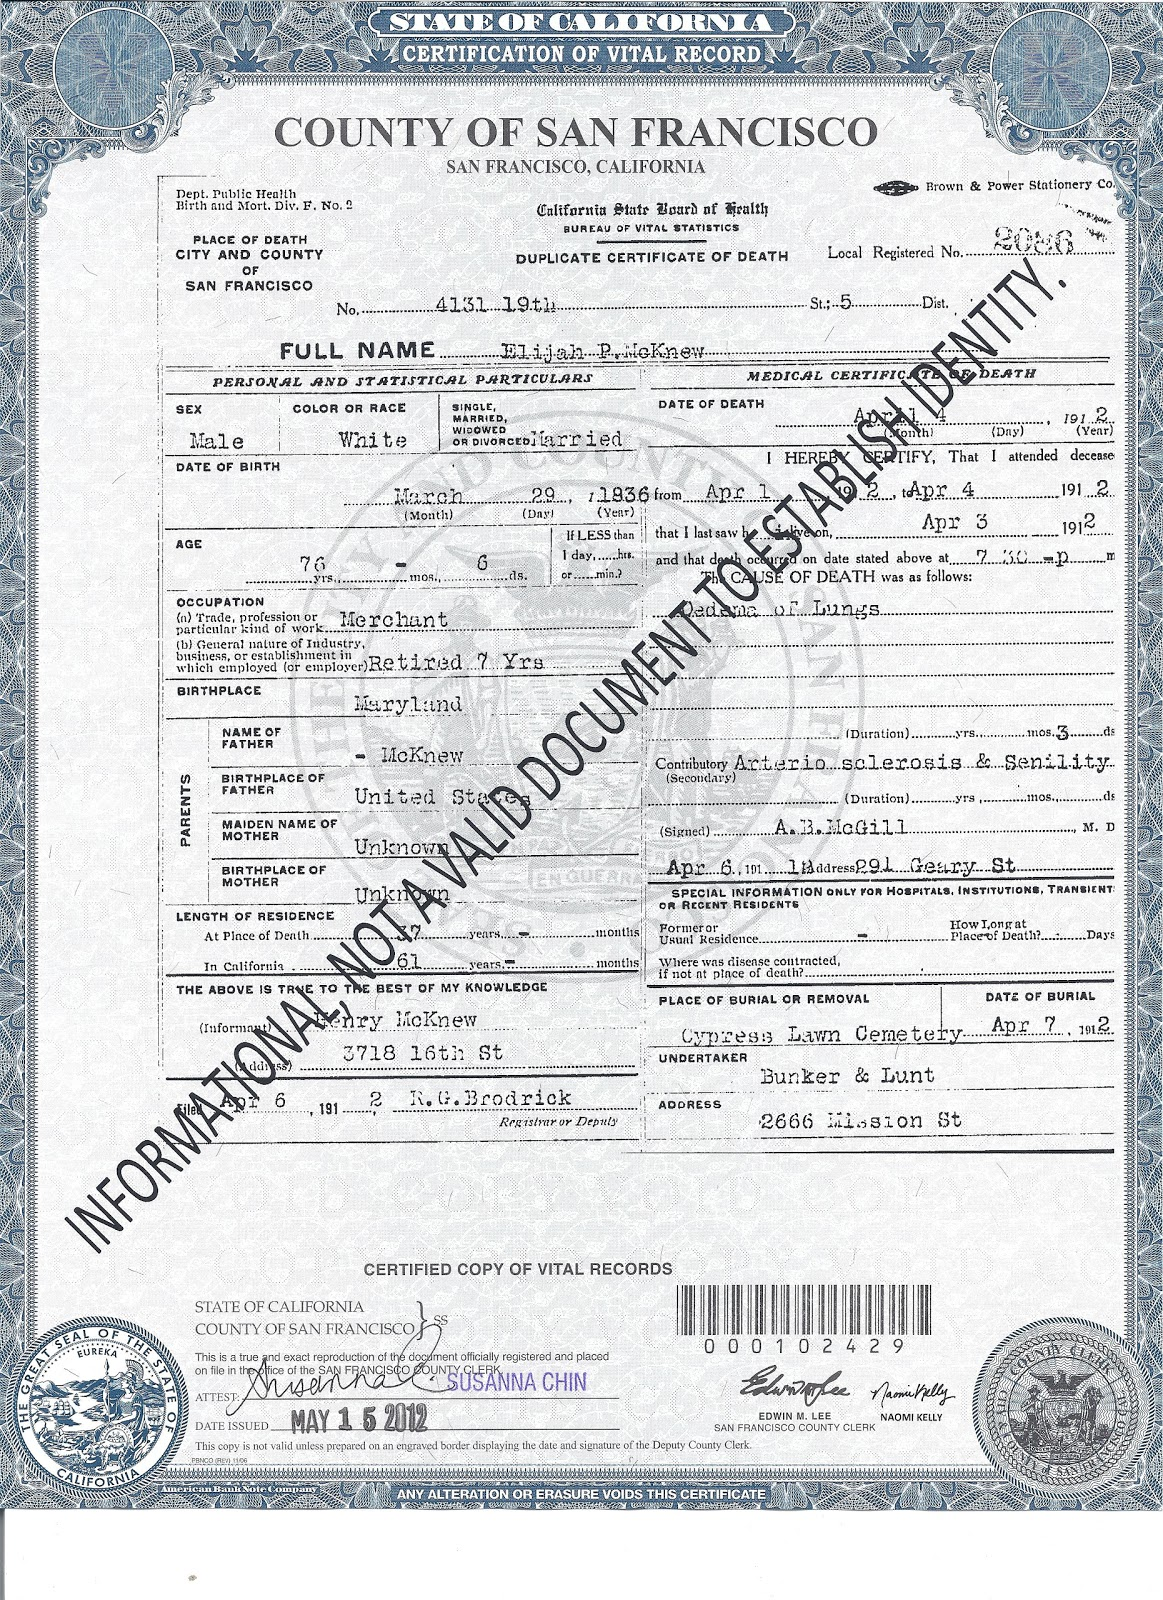 Genea musings treasure chest thursday death certificate for treasure chest thursday death certificate for elijah mcknew 1836 1912 1betcityfo Image collections